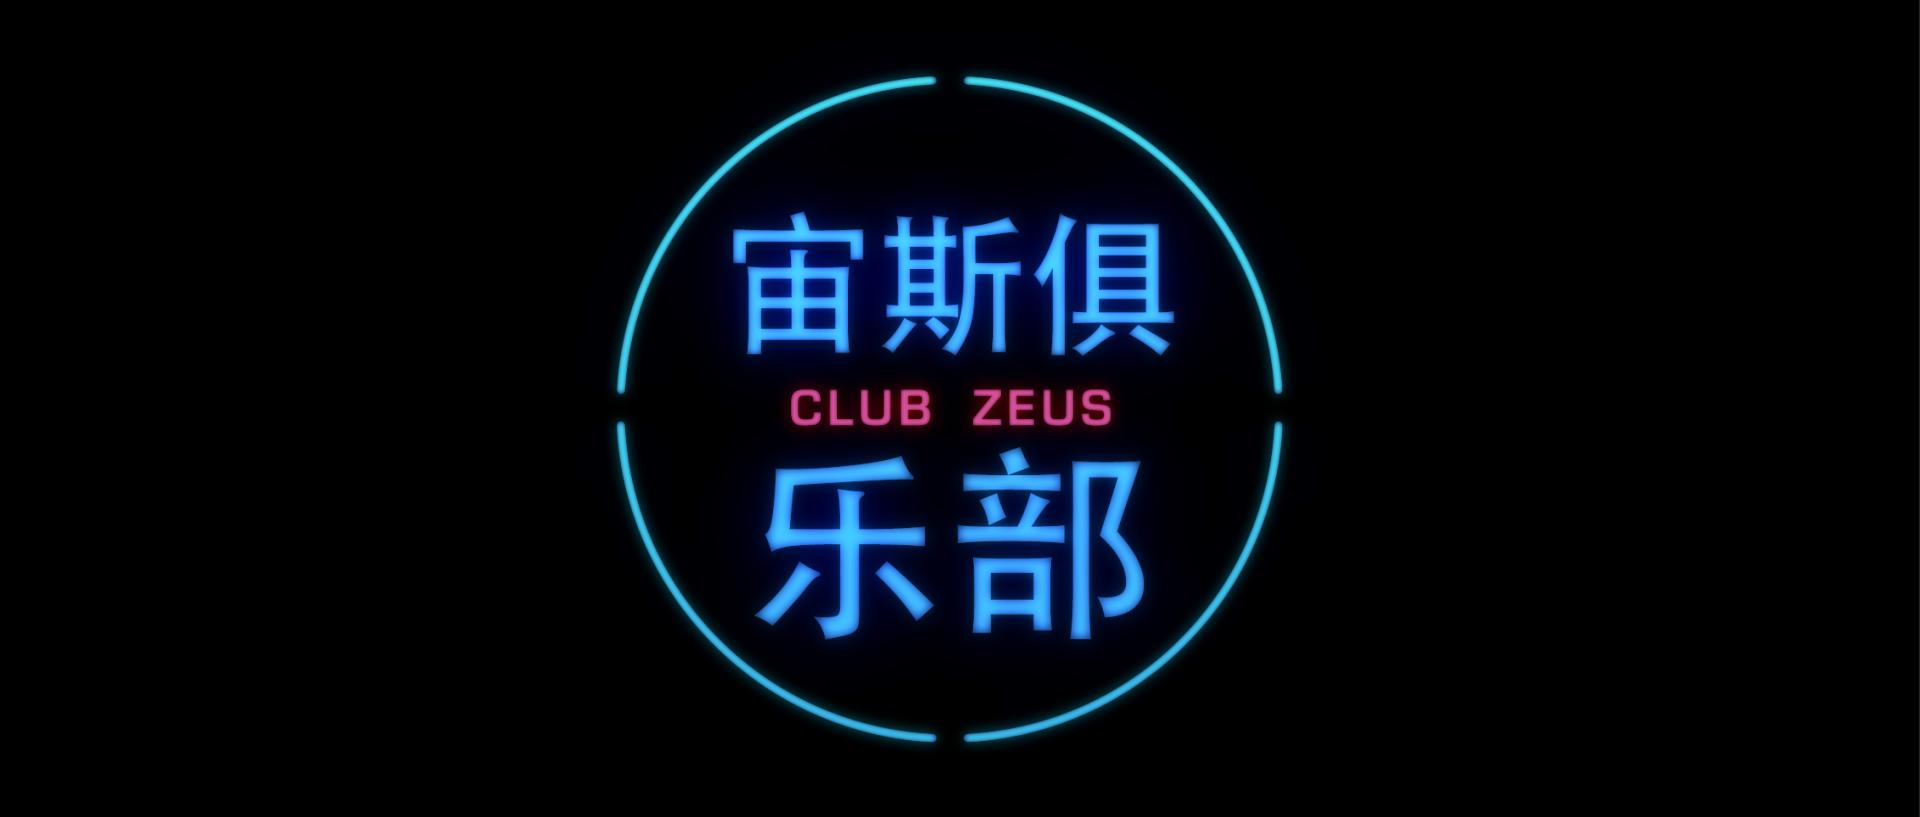 ClubZeus11.jpg